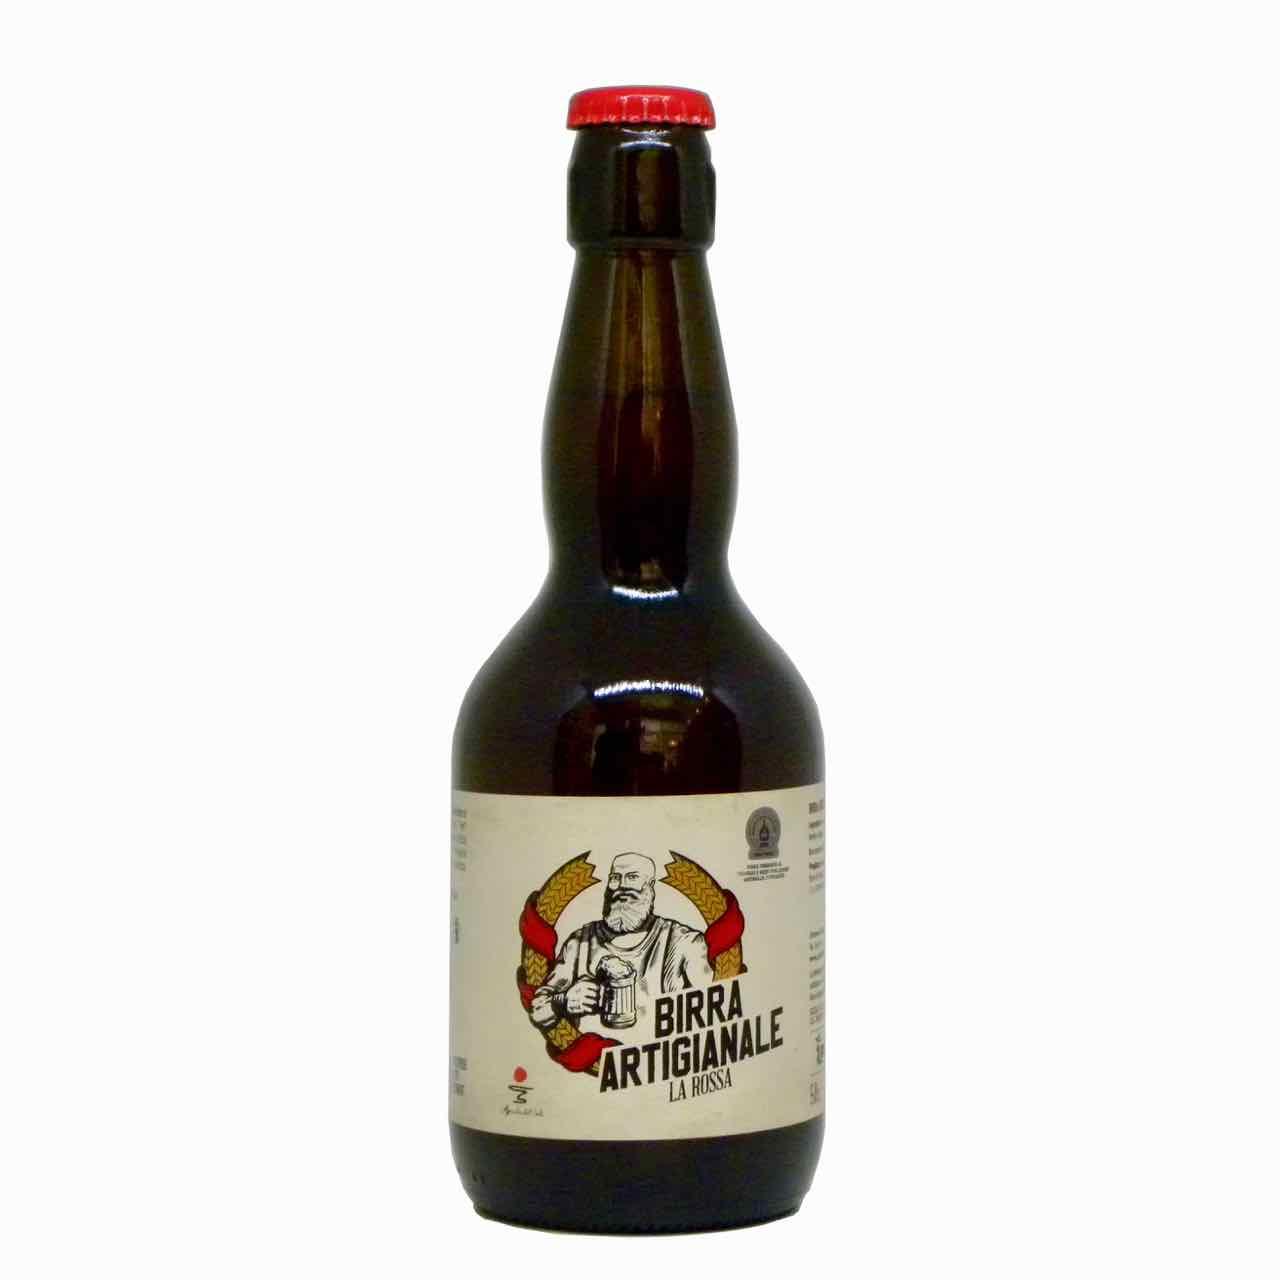 birra rossa artigianale fronte – artisan red beer – Agricola del Sole – Gustorotondo Italian food boutique – I migliori cibi online – Best Italian food online – spesa online